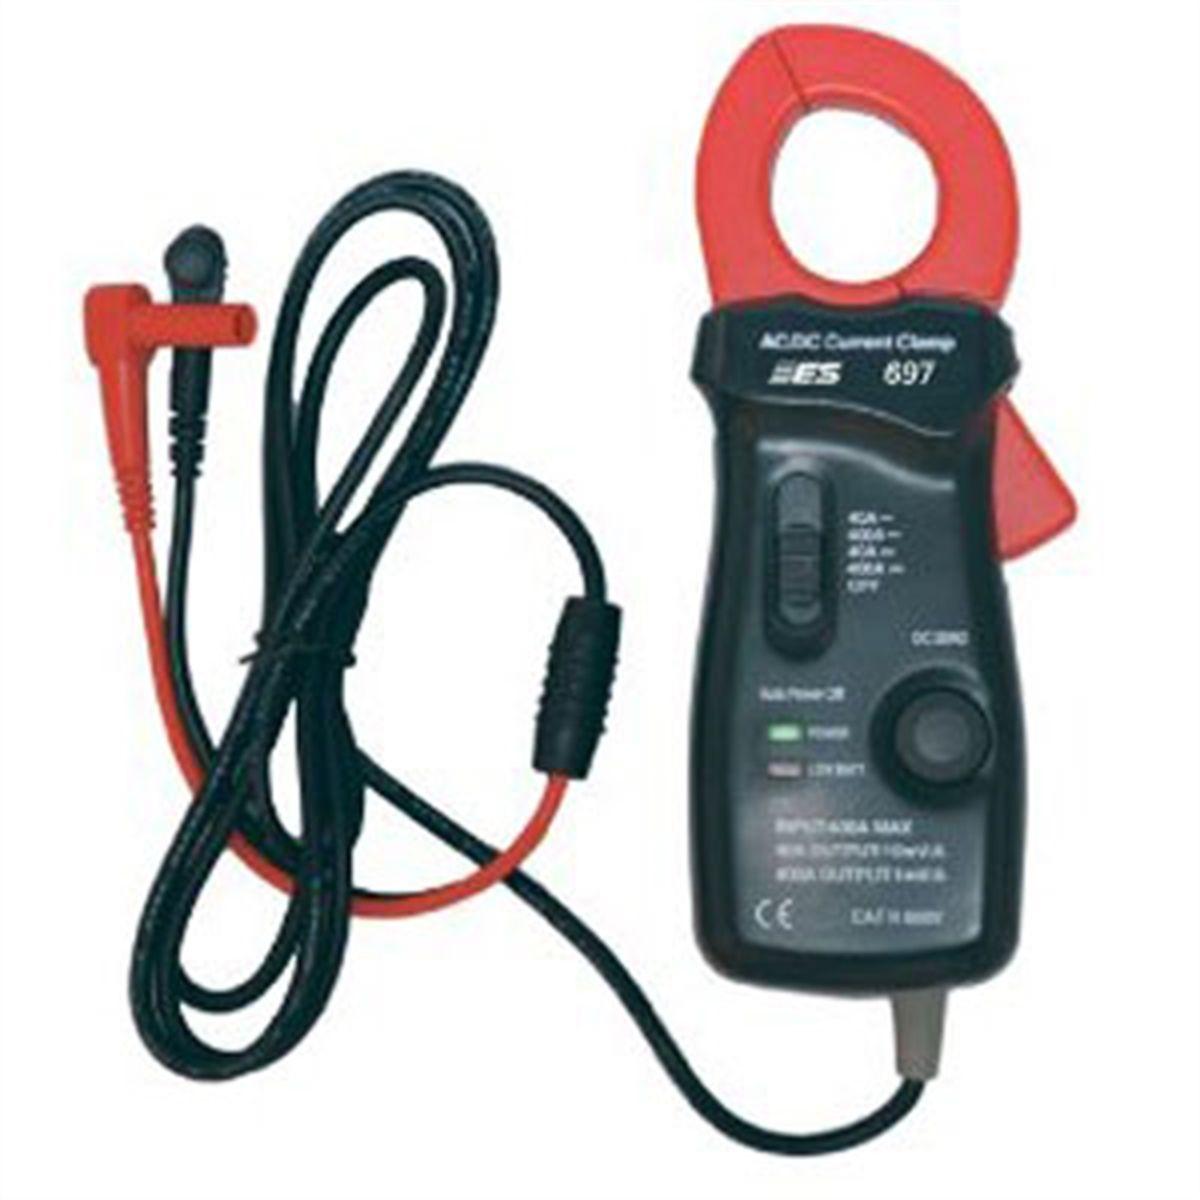 Otc Low Amp Probe : Electronic specialties dc ac current probe amp